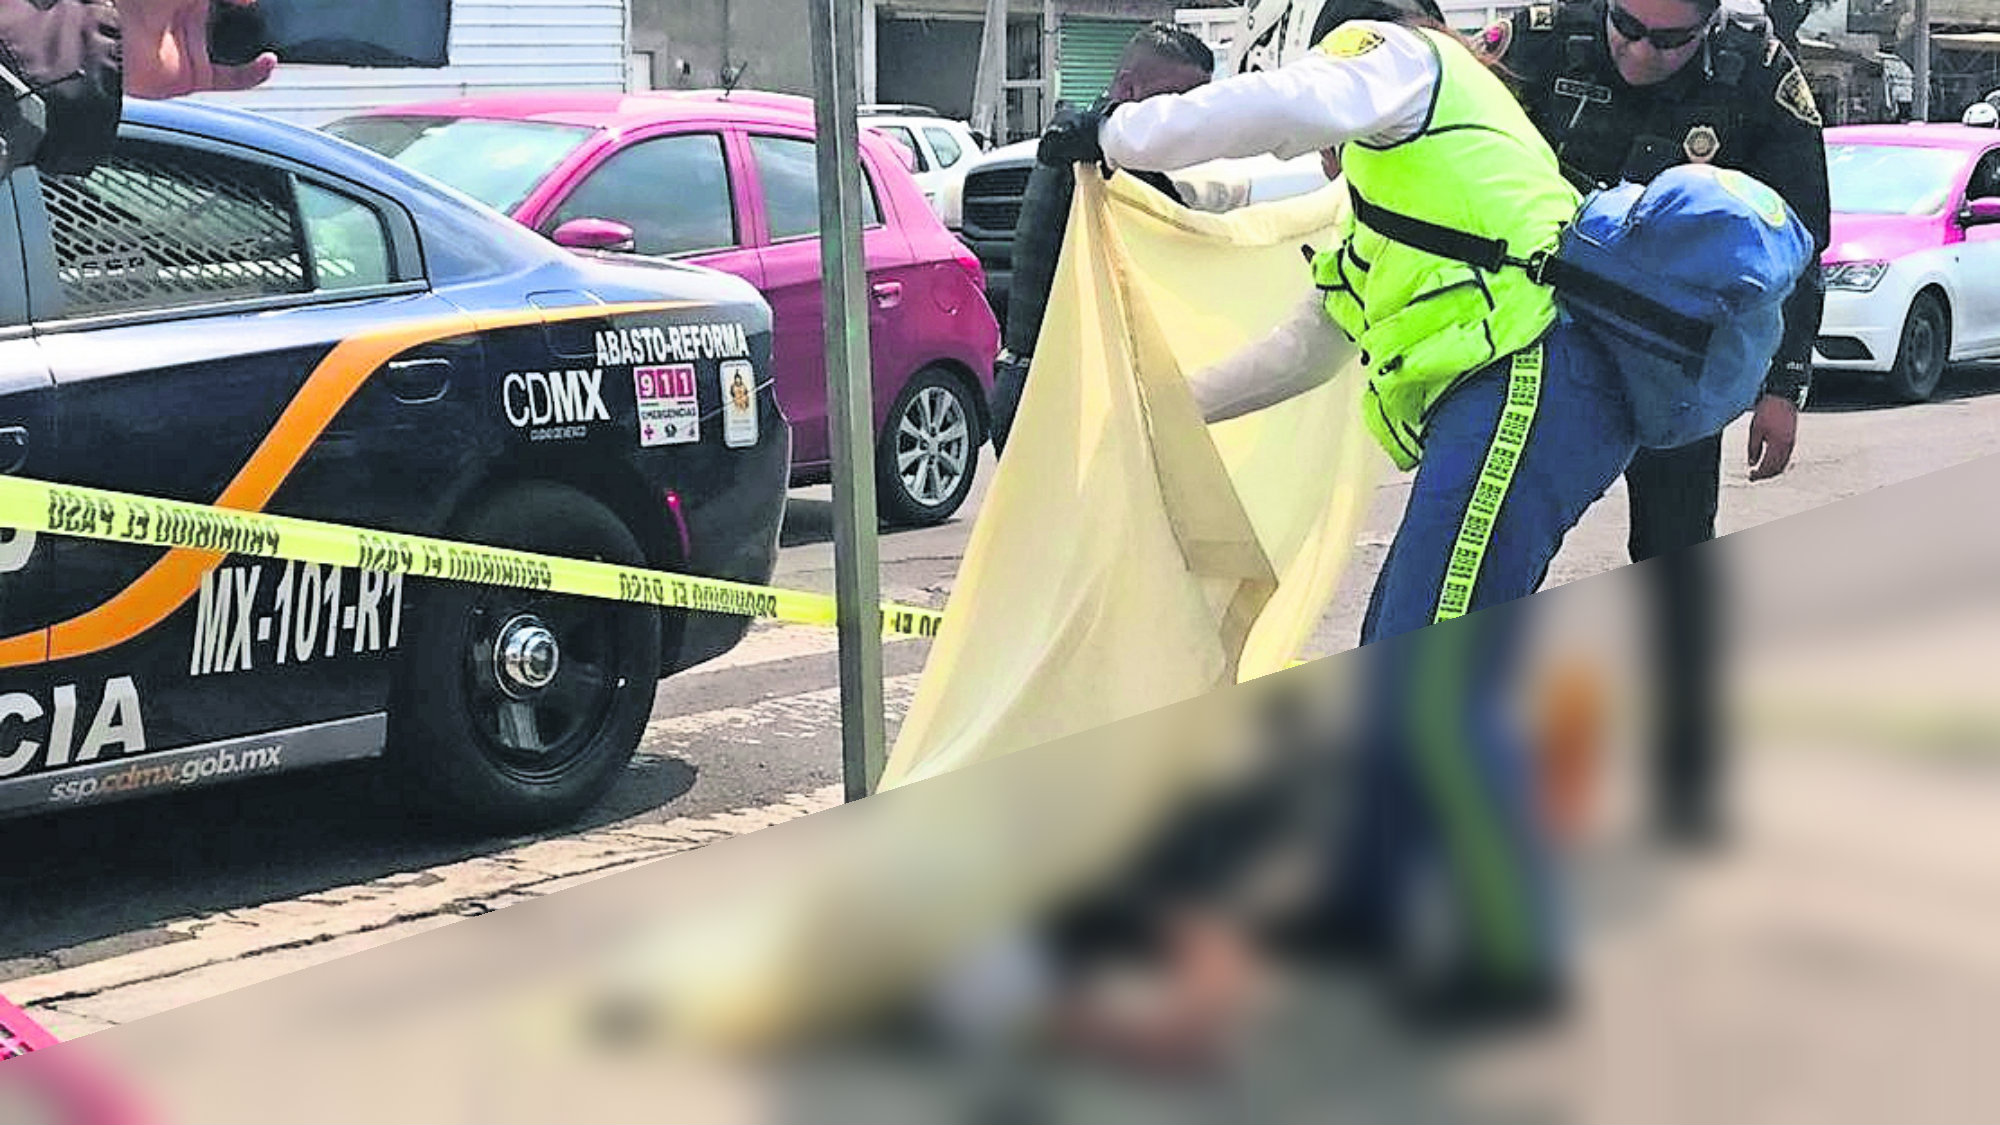 Motociclista muerto Proyectado Exceso de velocidad CDMX Iztapalapa